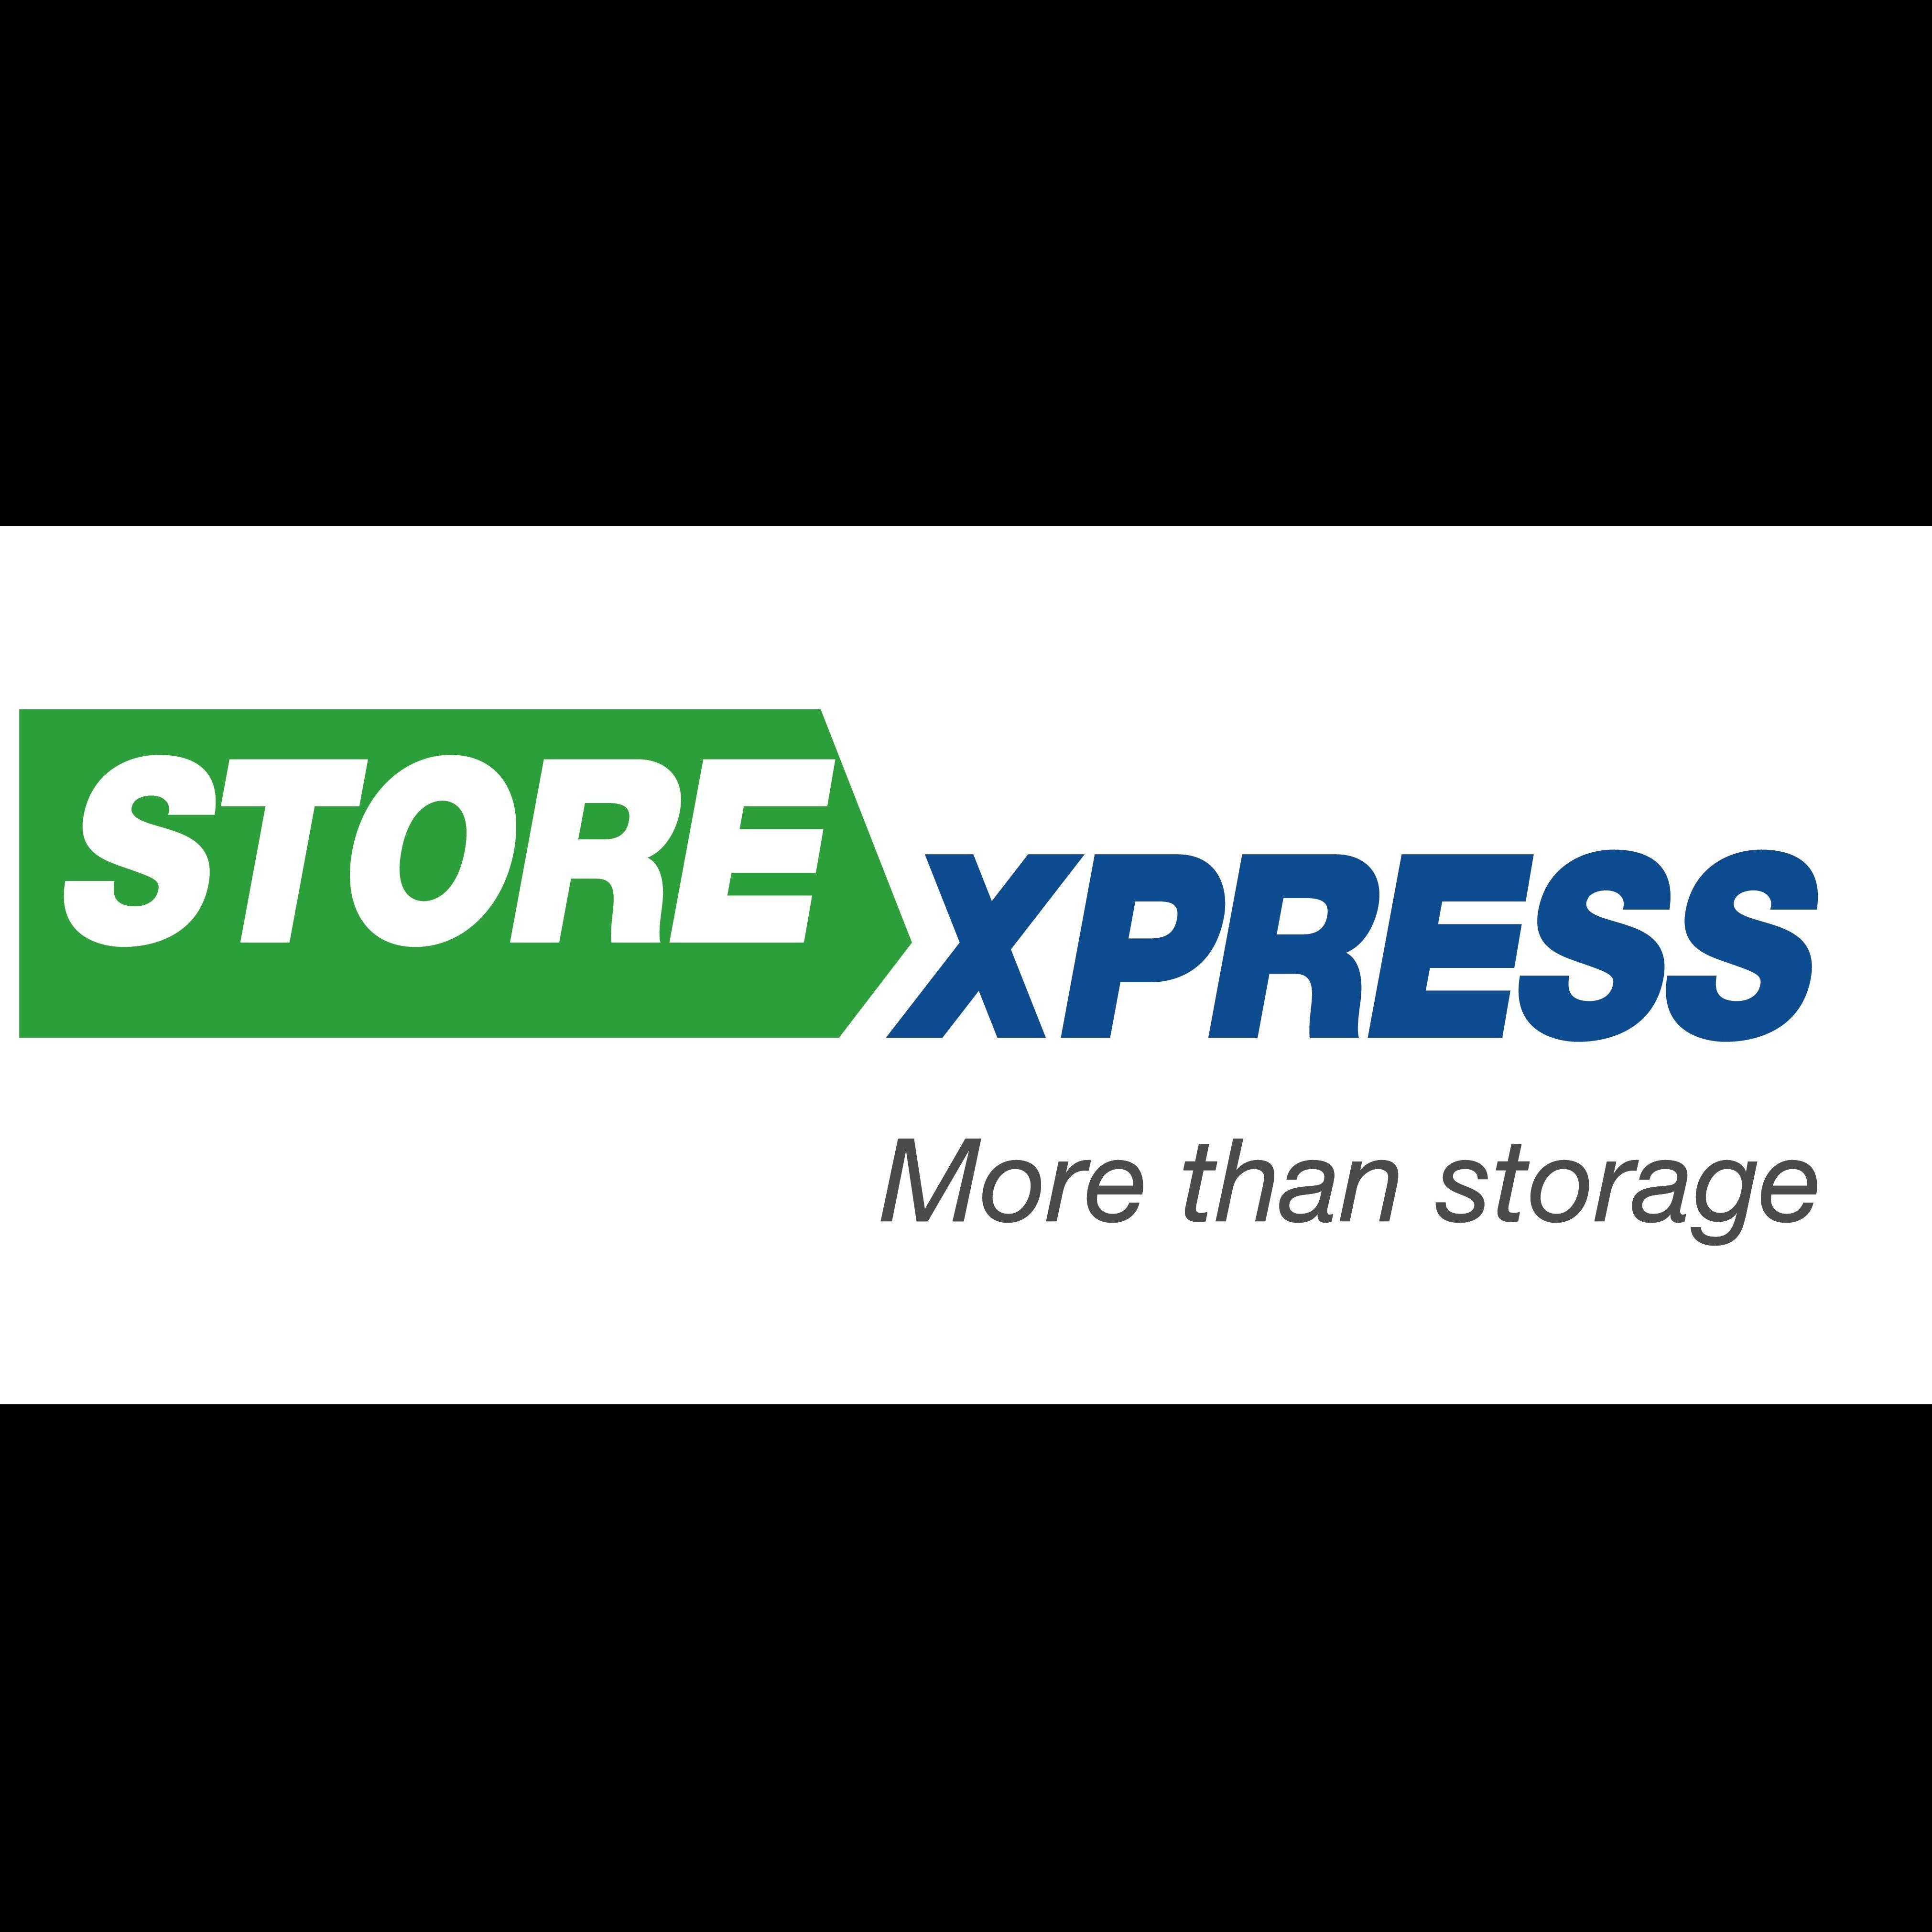 STORExpress image 2